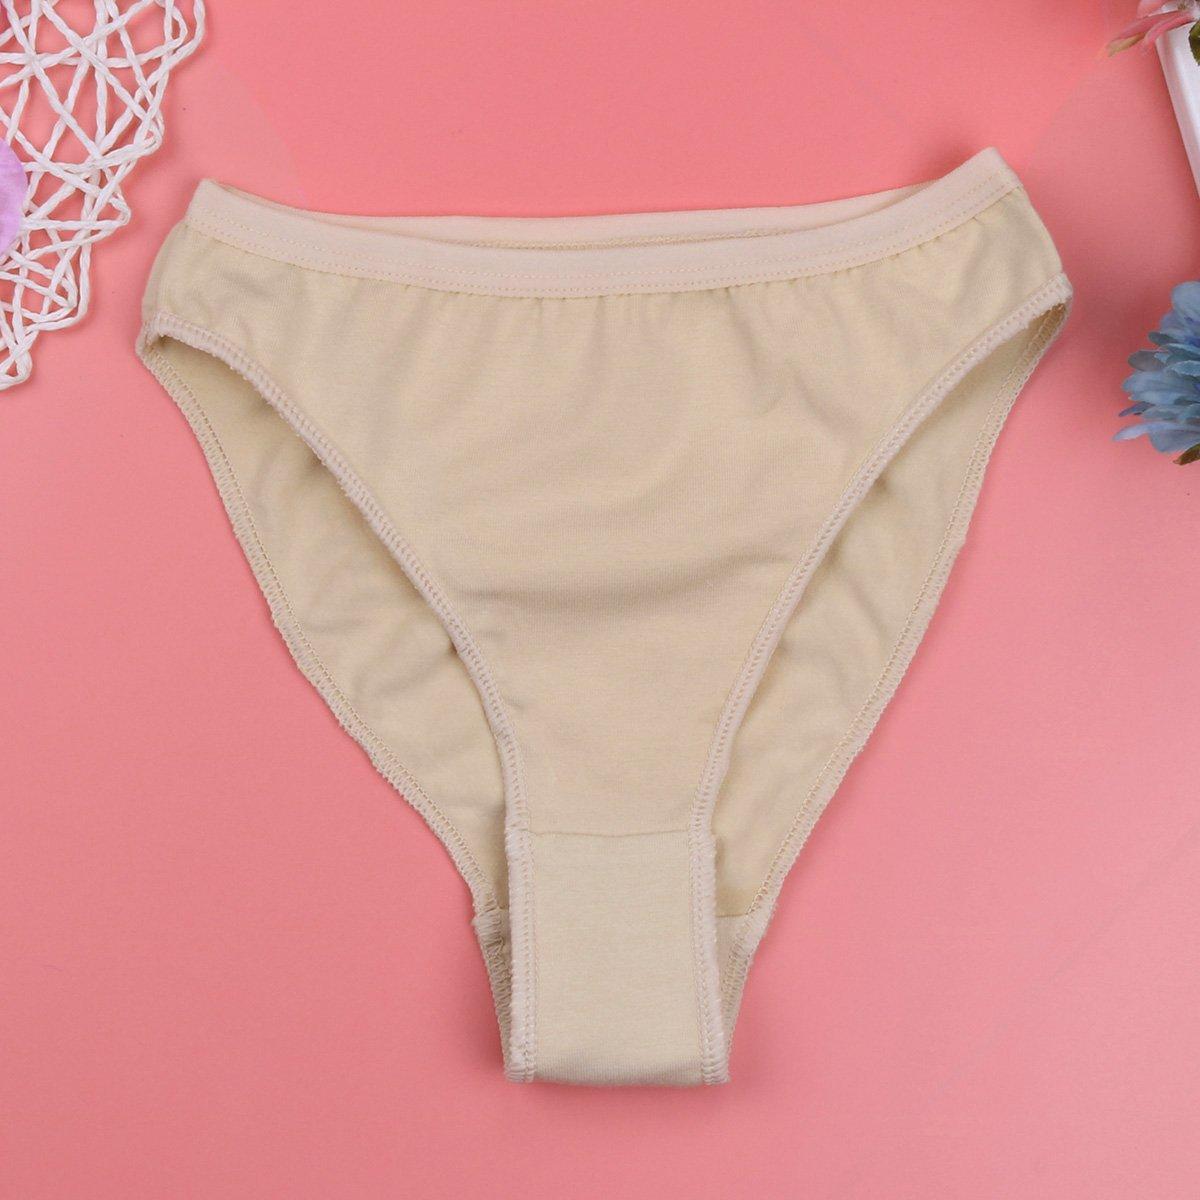 moily Girls High Cut Seamless Underwear Gymnastics Ballet Dance Underpants Briefs Shorts